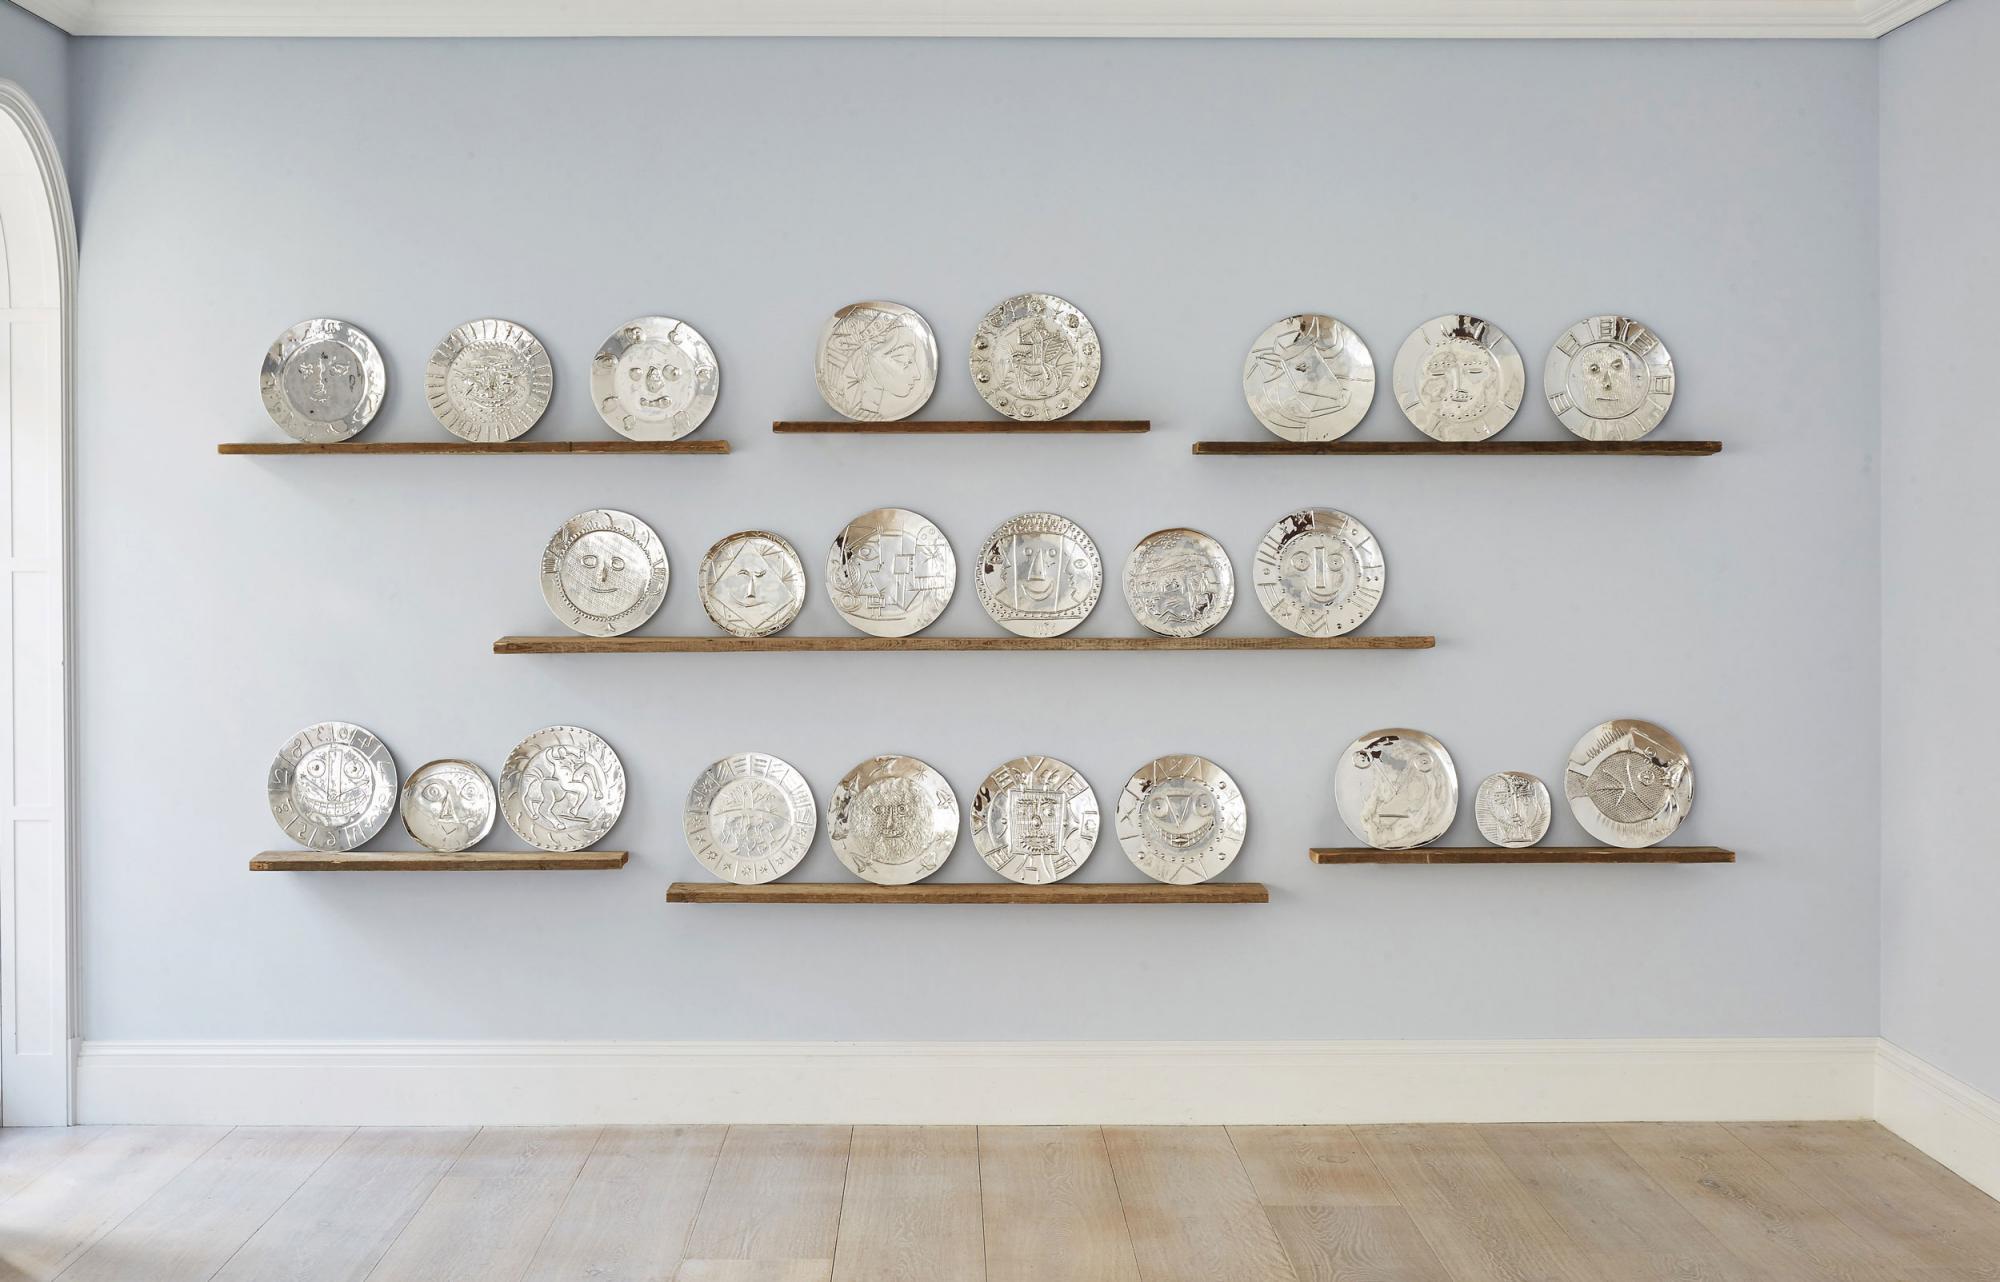 Lot-144,-Pablo-Picasso,-A-Complete-set-of-24-silver-plates,-1956-1967,-est_-£1_2-1.jpg